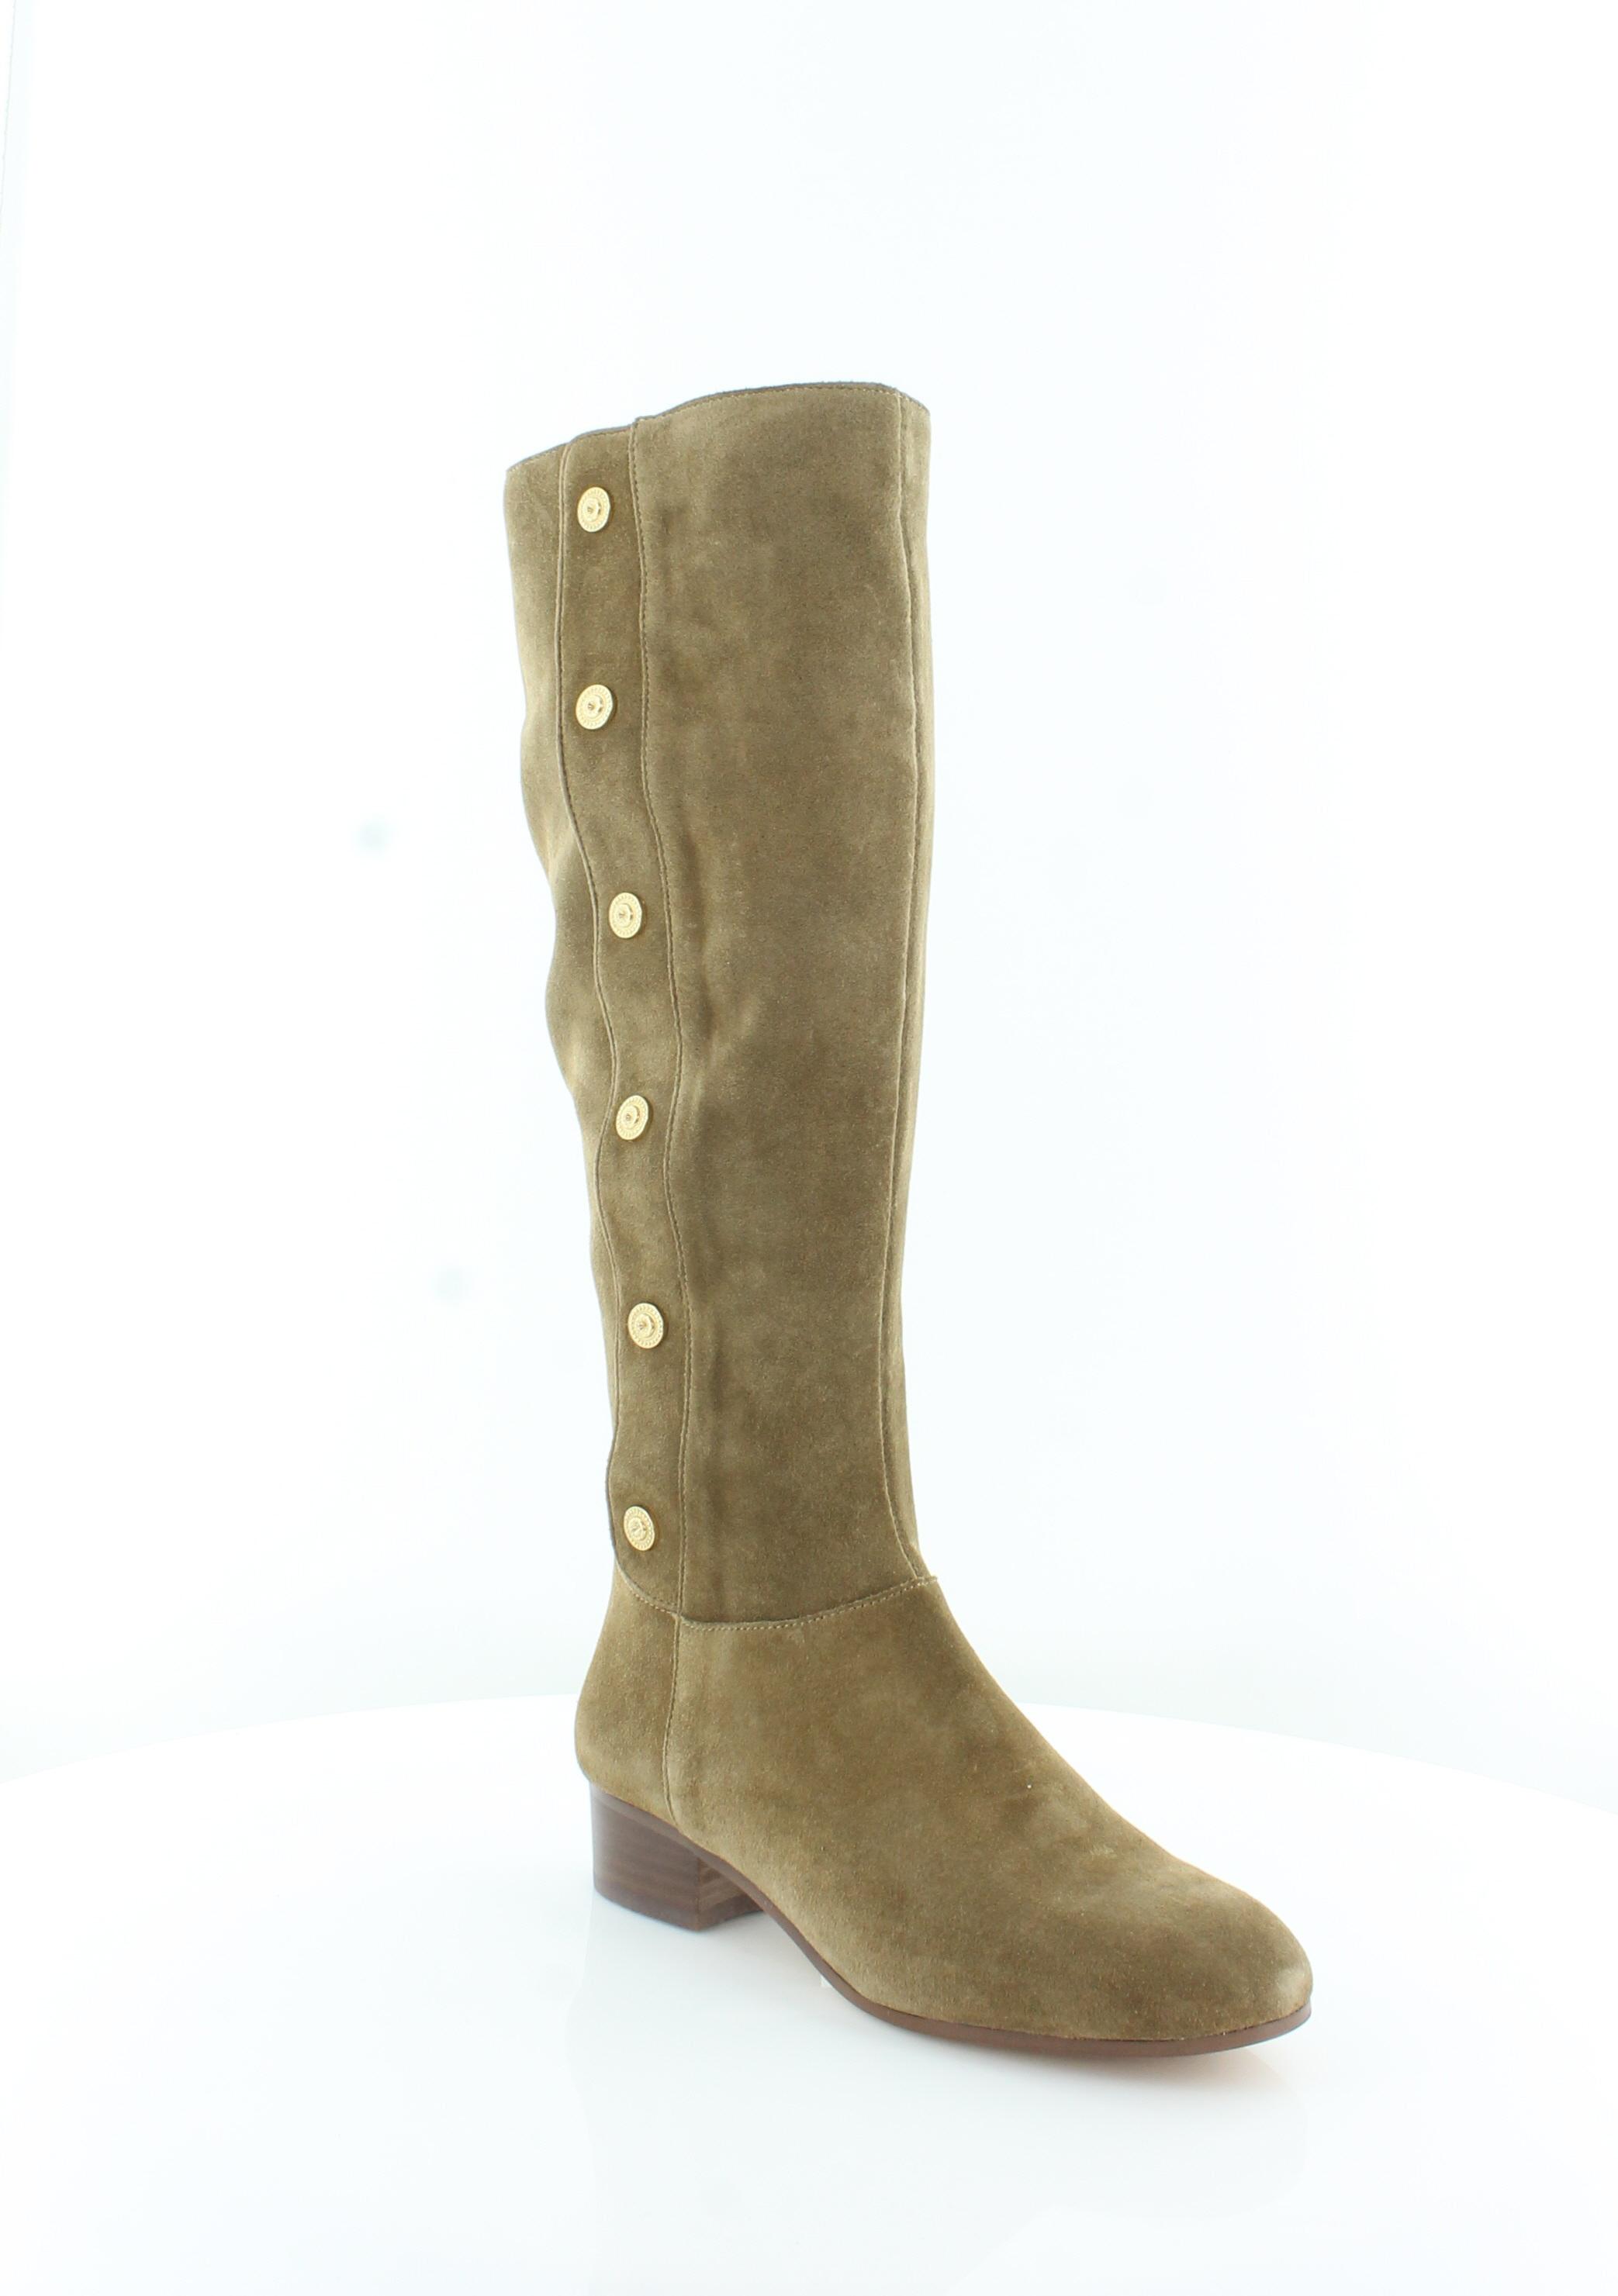 ba2bd16ddf6 Nine West Women's Oreyan Knee High Boot 9 B(m) US Green Suede